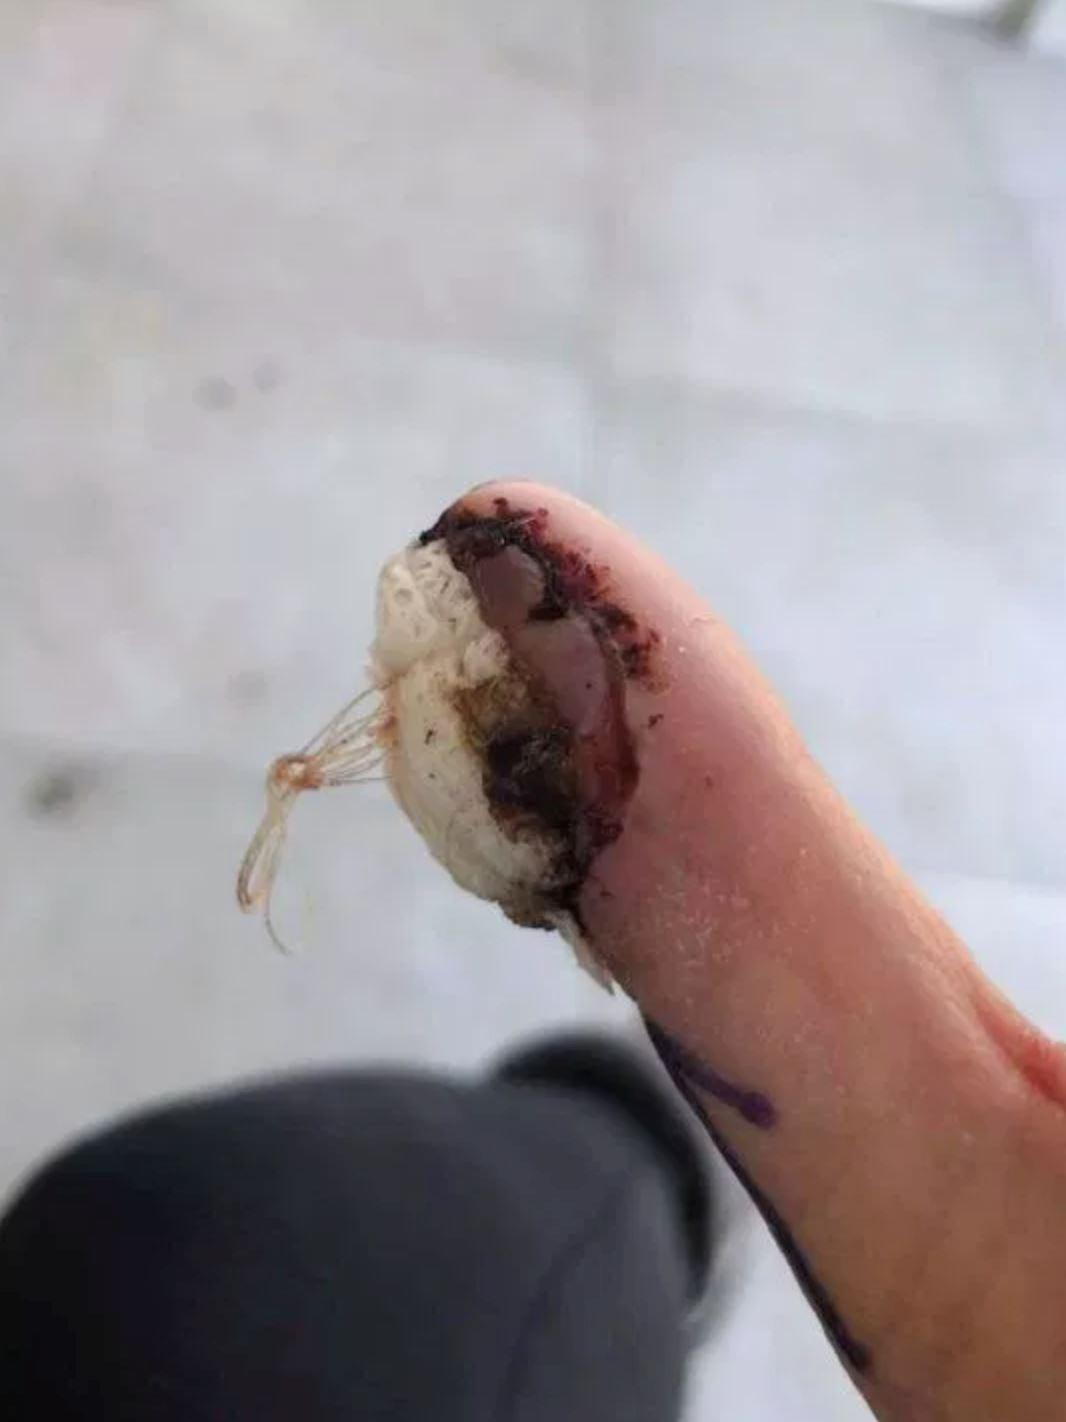 dulu suka gigit kuku, sekarang jari ibu kena potong pula